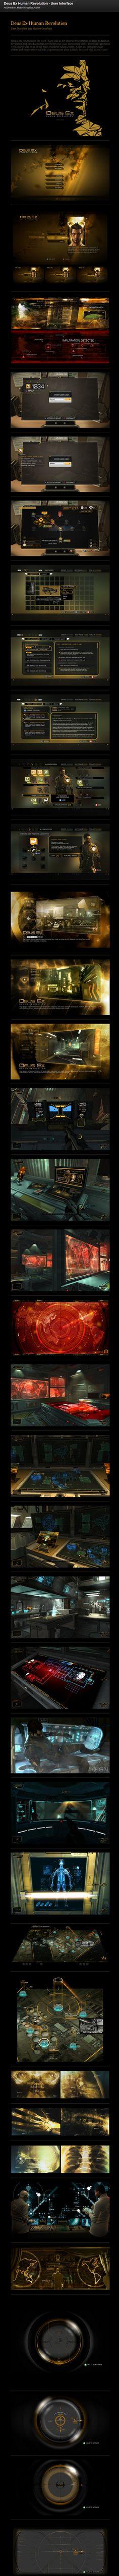 PROJECT BY Eric Bellefeuille http://www.behance.net/gallery/Deus-Ex-Human-Revolution-User-Interface/2465641